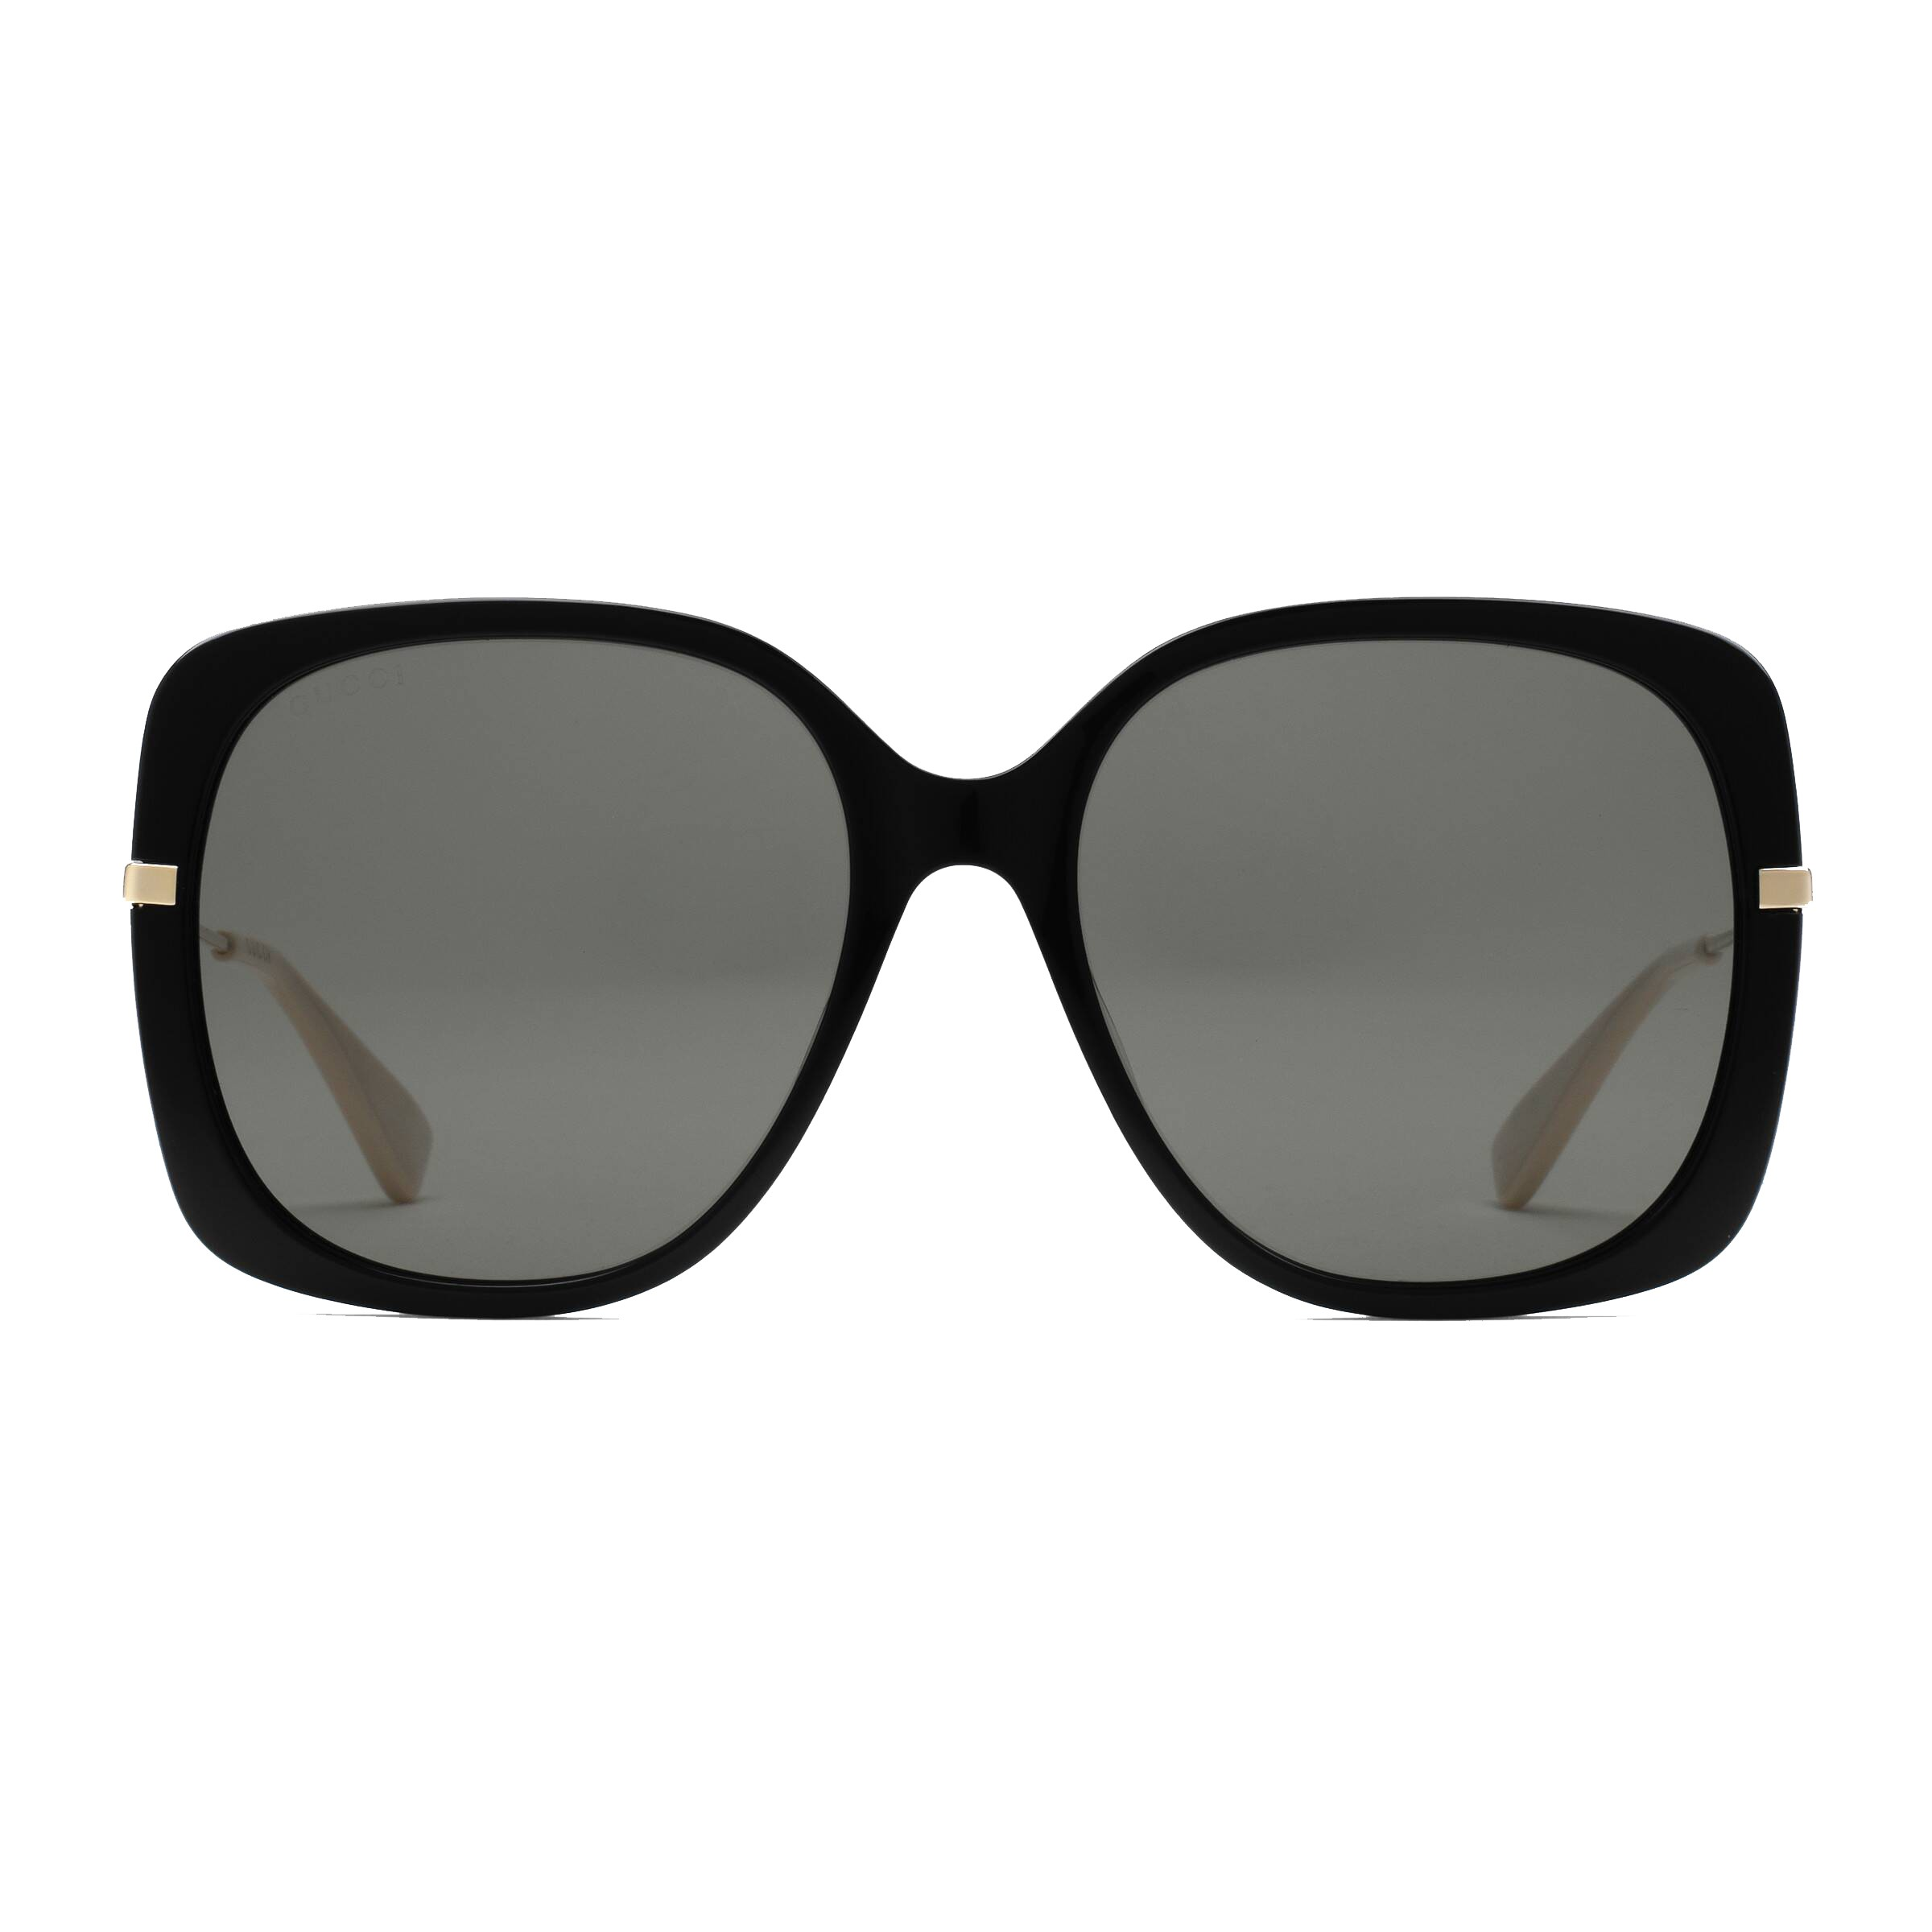 efd6aa9bac6e Gucci - Square Acetate Sunglasses - Black - Gucci Eyewear - Avvenice